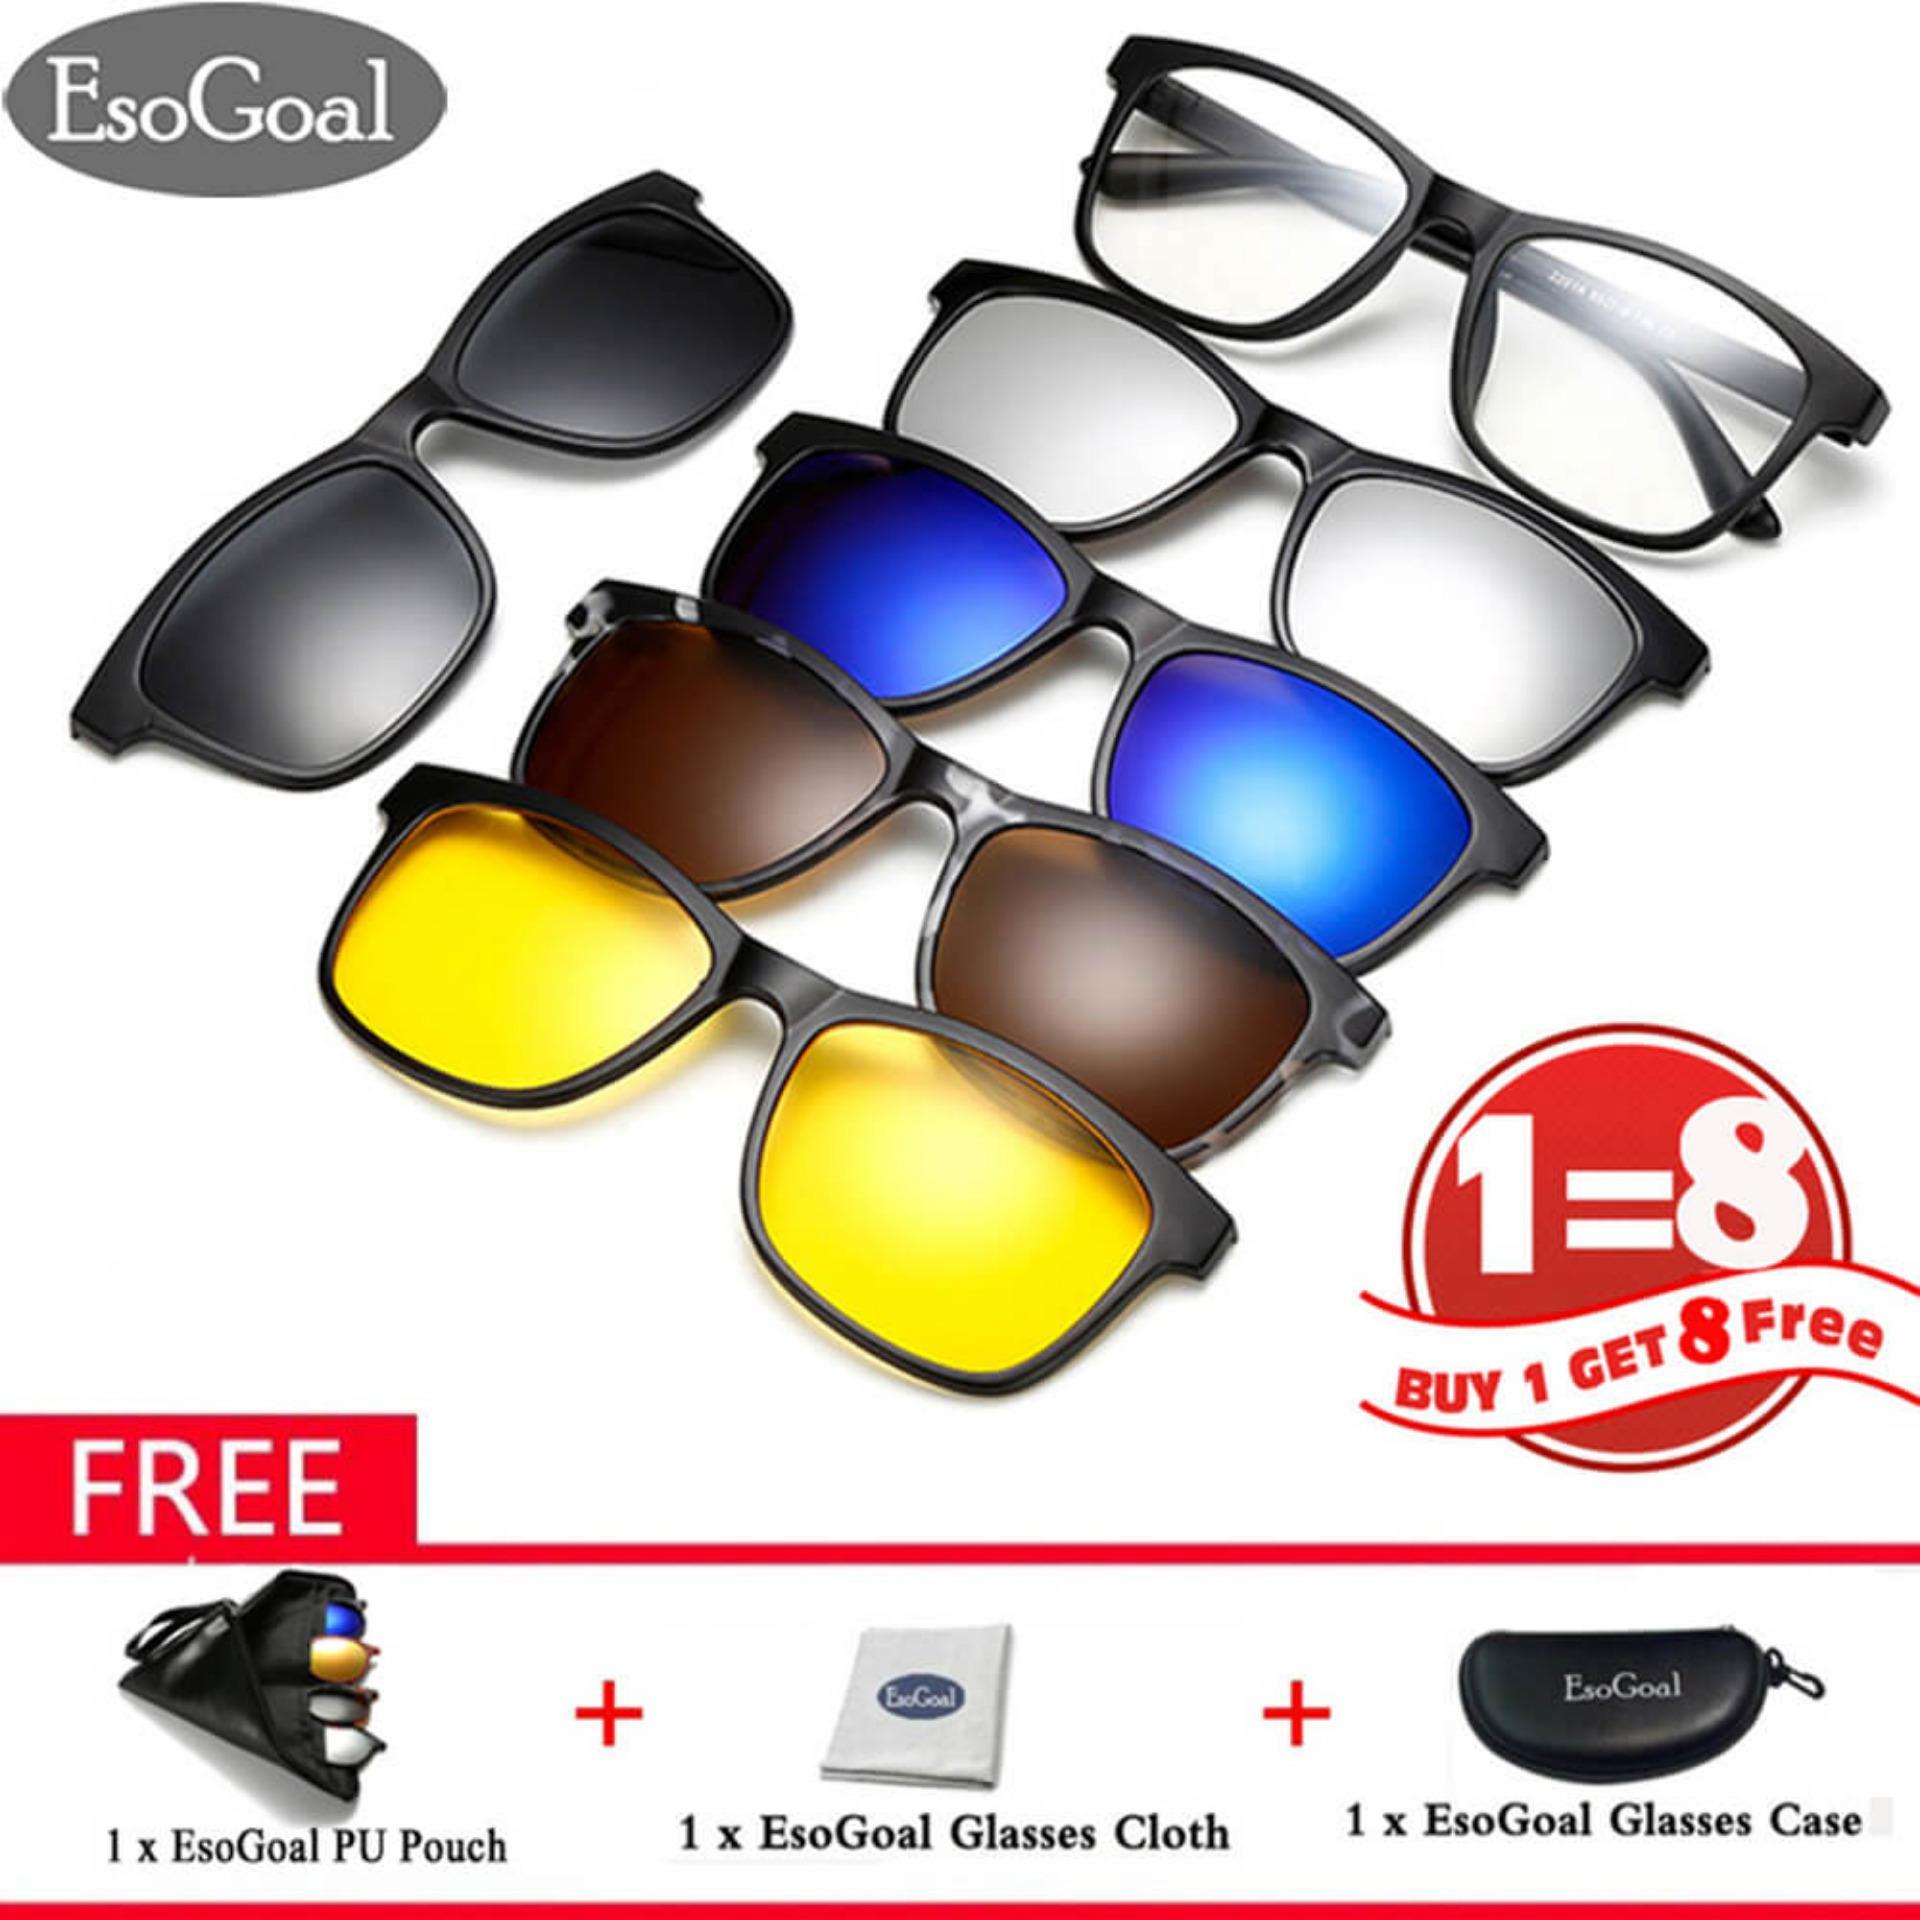 EsoGoal Kacamata Magnetik Clip On Glasses Unisez Lensa Polarised Frame  Retro Dengan 5 Lensa da64bd2186